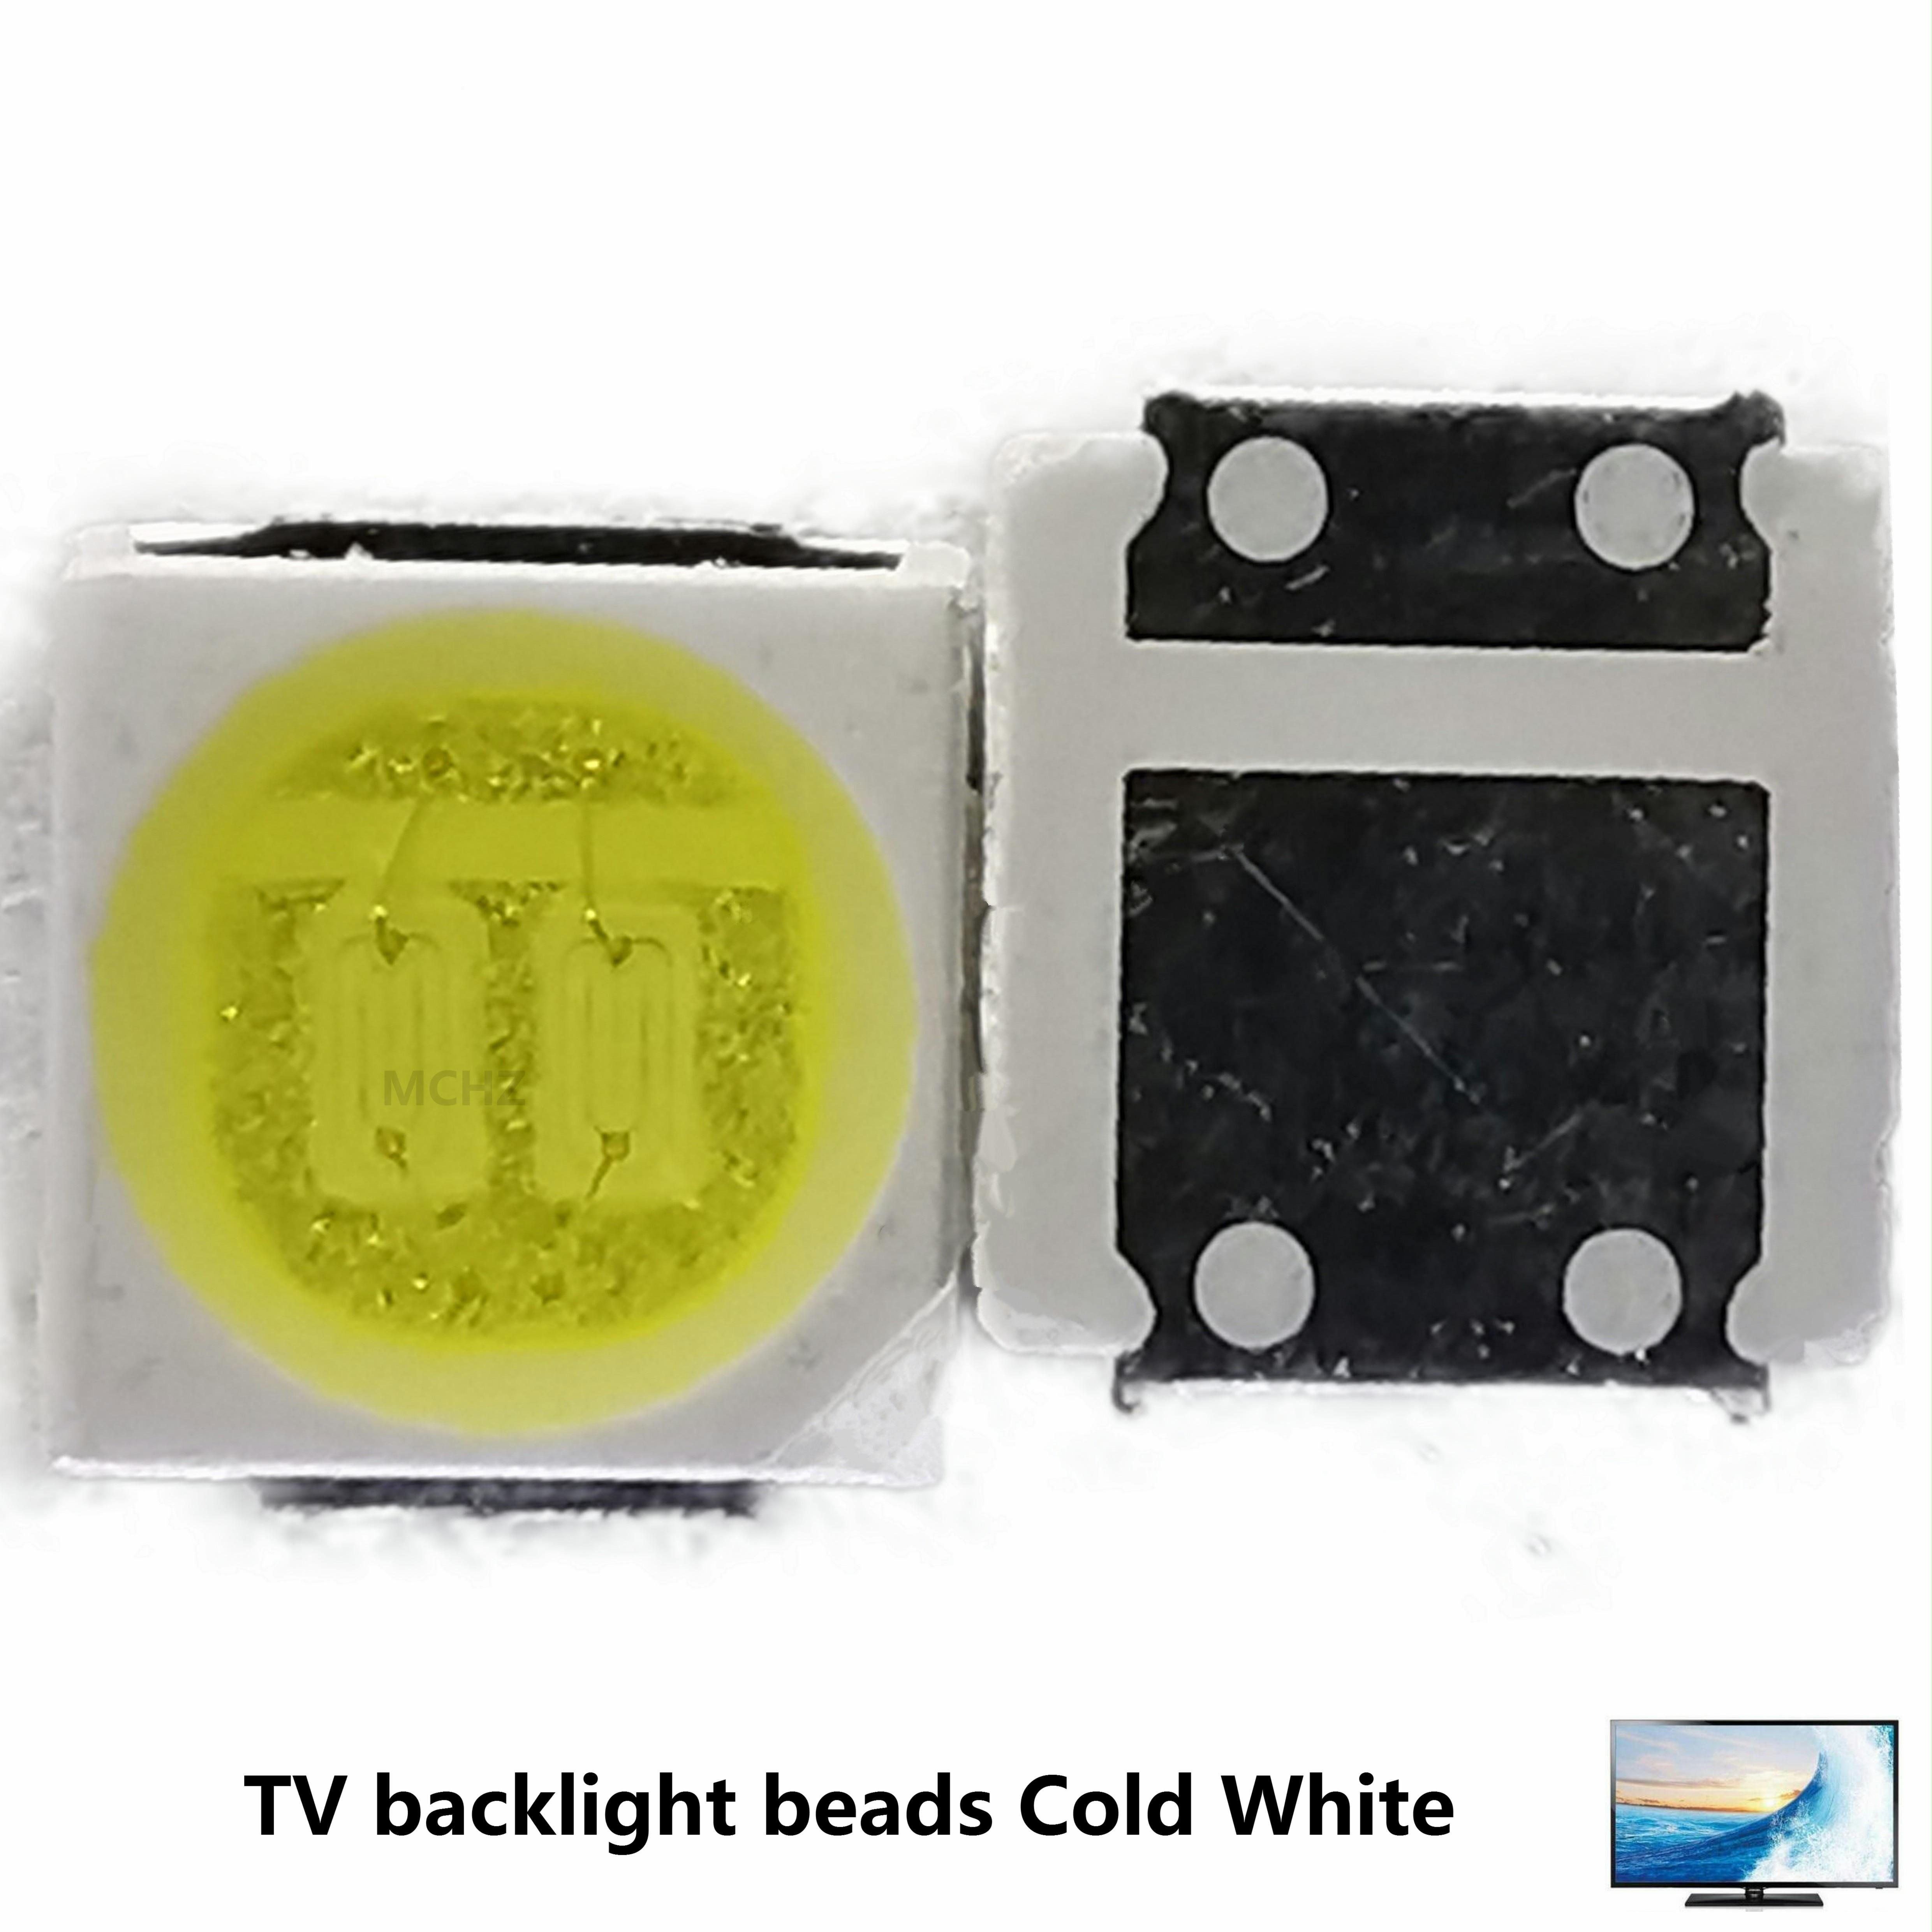 100PCS Factory Biggest Discount LED Backlight  Osram Replace Lg Jufei Seoul 3030 3528 2835 3-3.6V 2W 220l LM Cool White 600MA